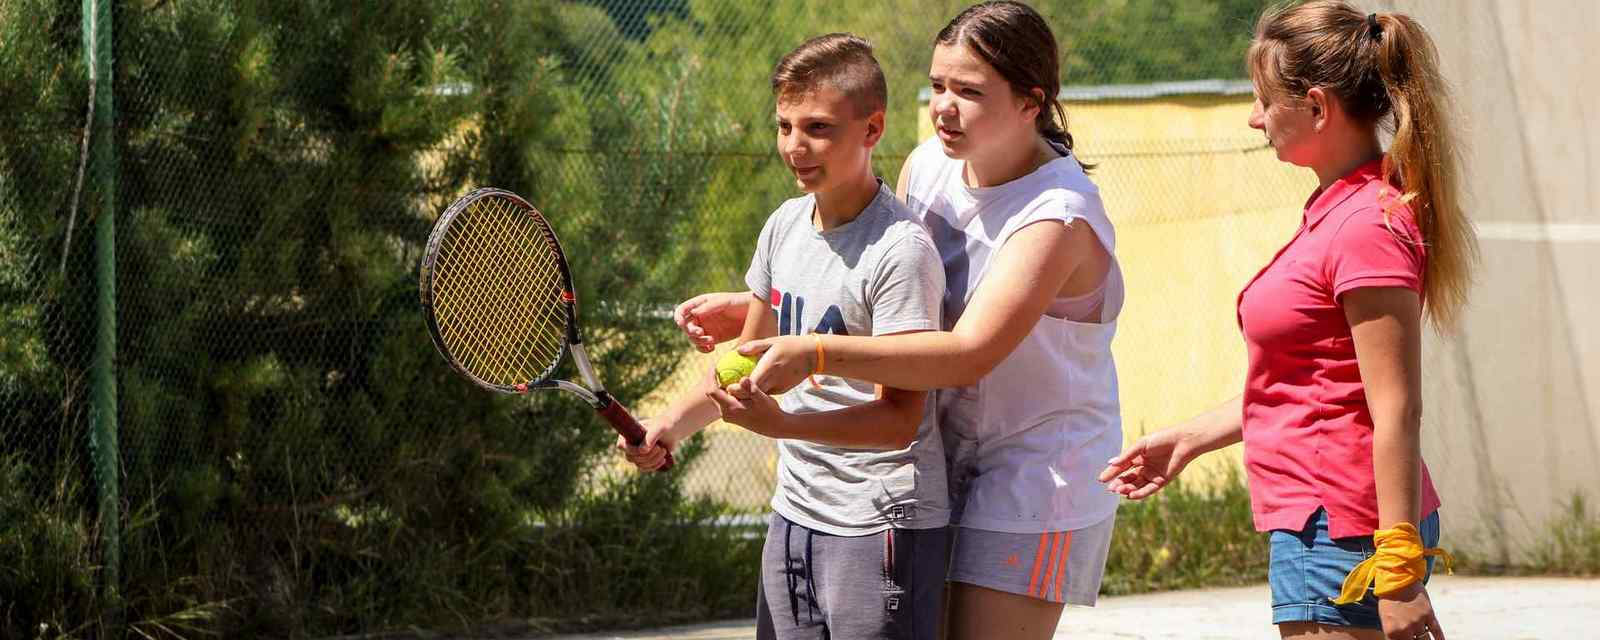 slide-4-tennis-1600x640